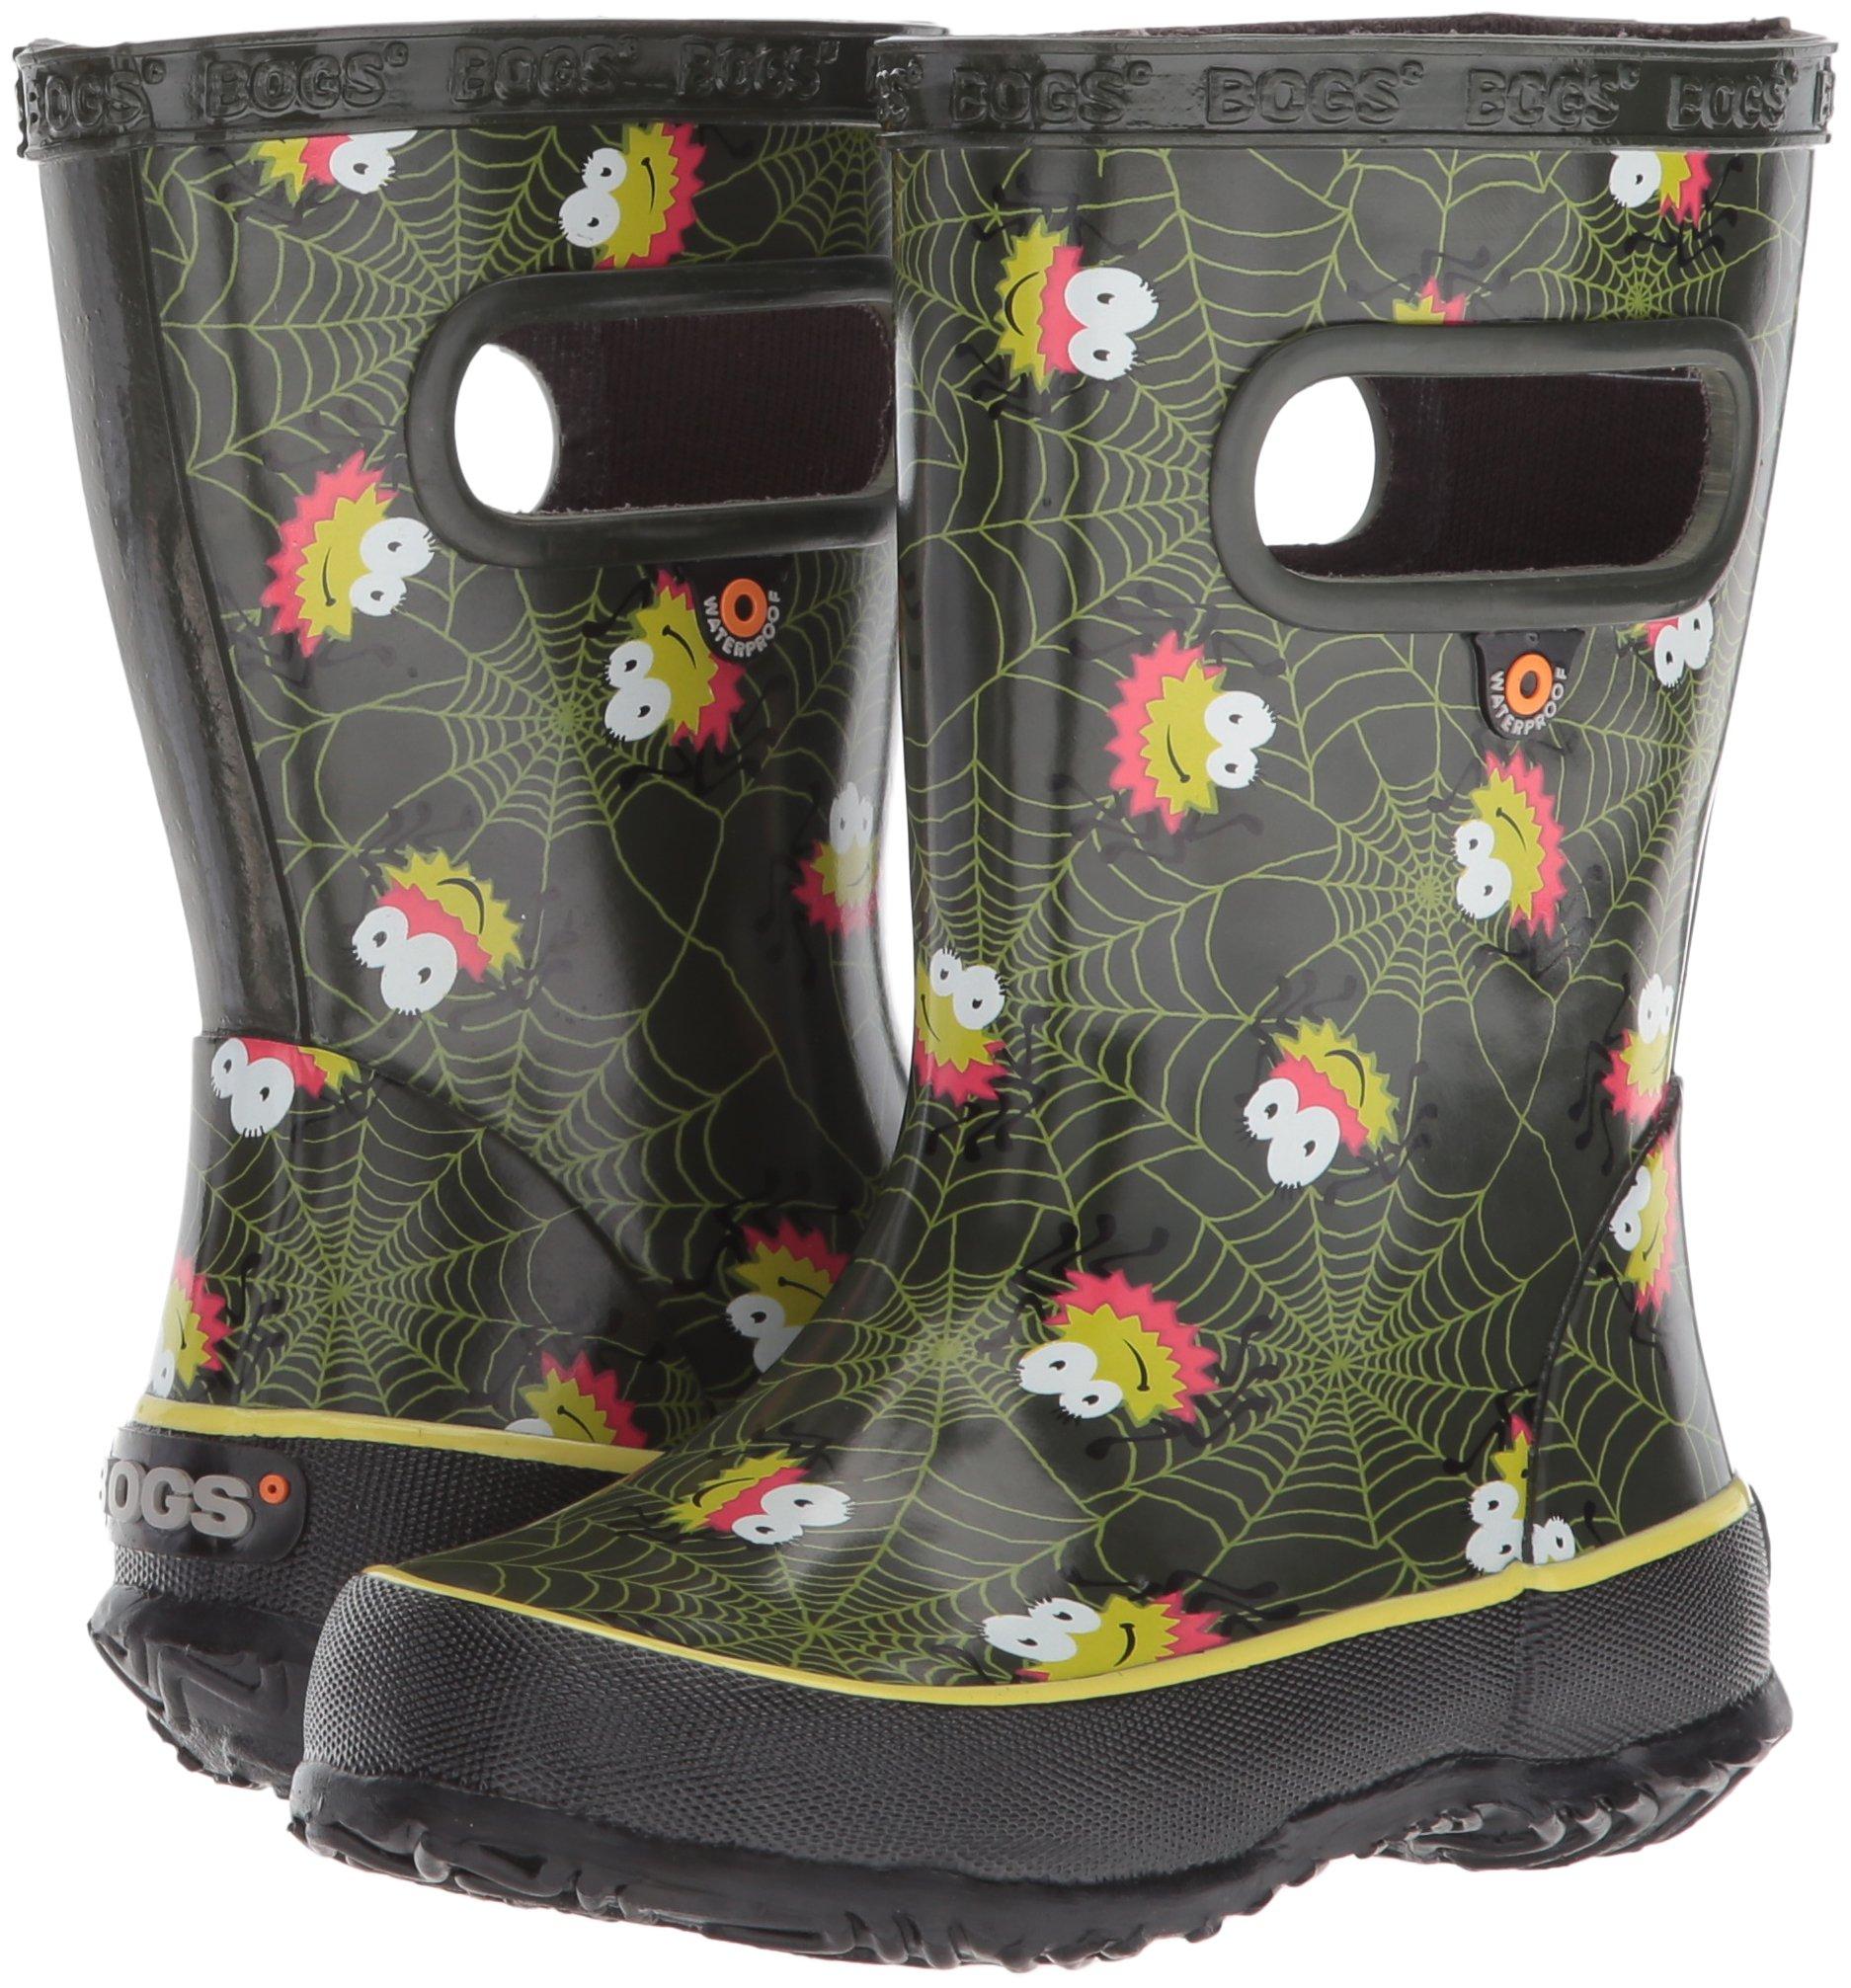 Bogs Kids' Skipper Waterproof Rubber Rain Boot for Boys and Girls,Smiley Spiders/Dark Green/Multi,11 M US Little Kid by Bogs (Image #6)